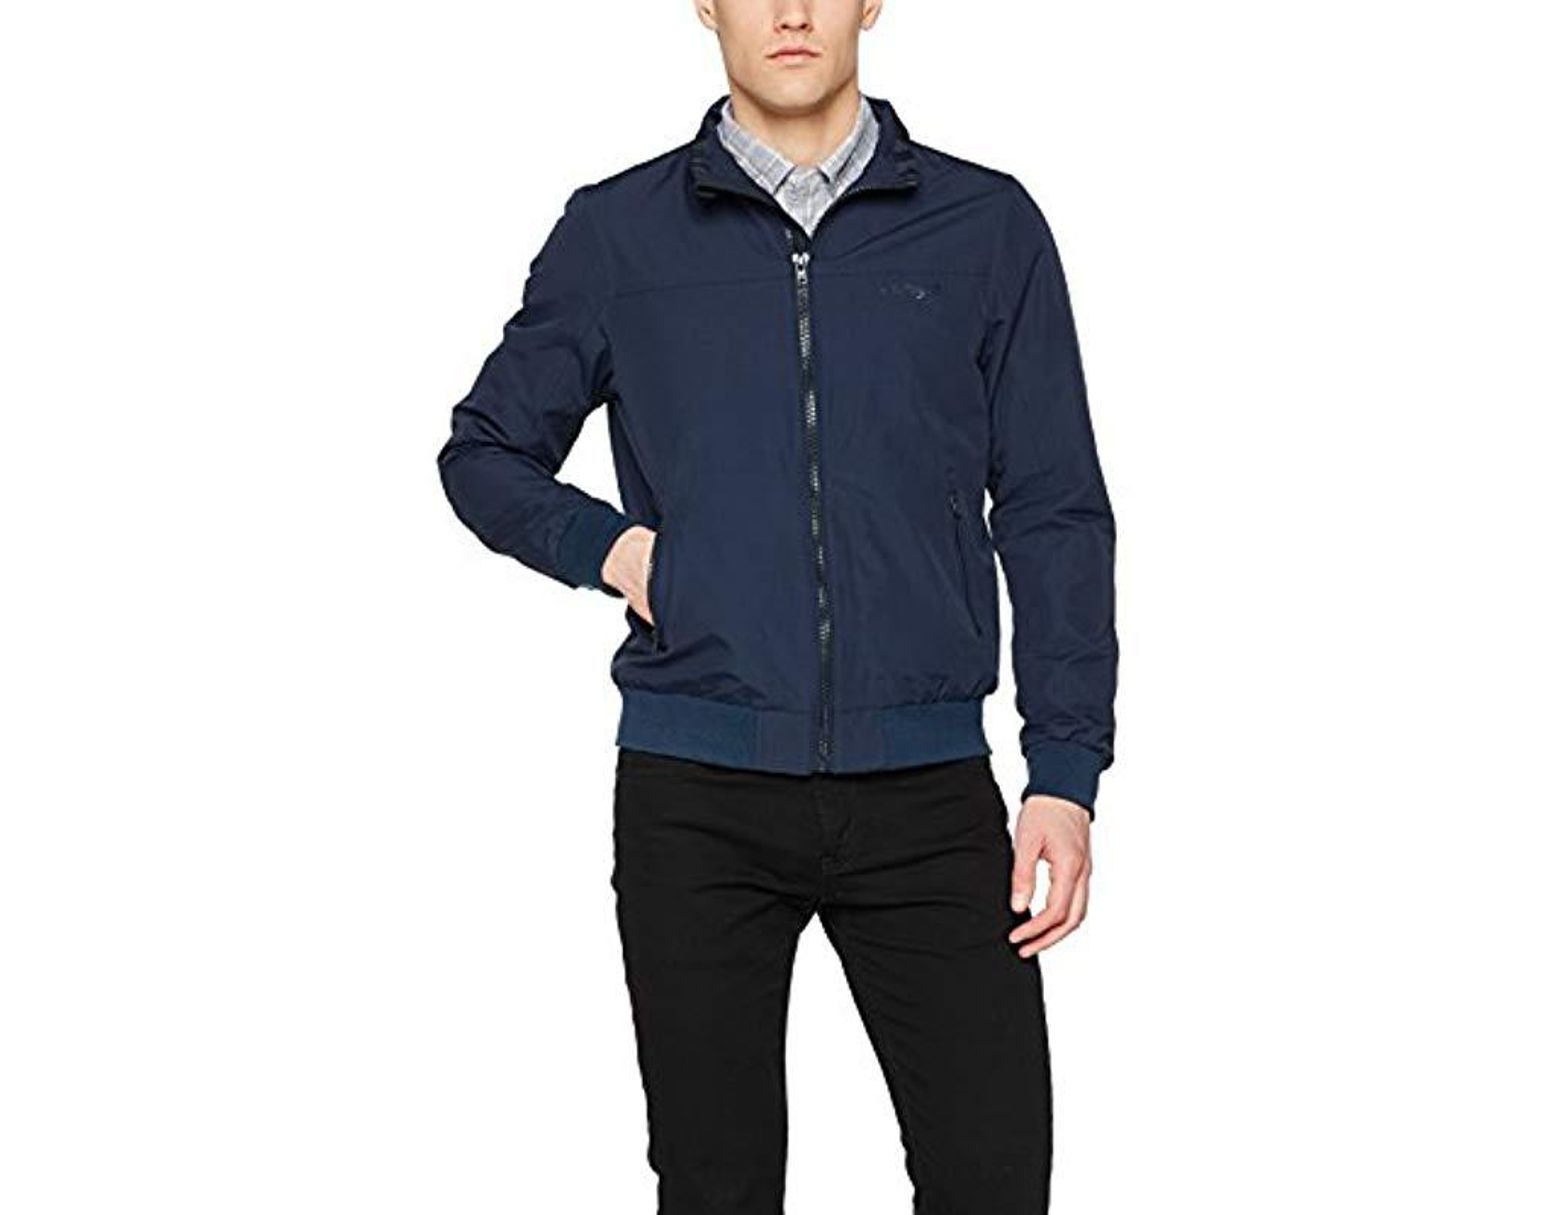 647cf0383 Wrangler Bob The Bomber Jacket in Blue for Men - Save 8% - Lyst